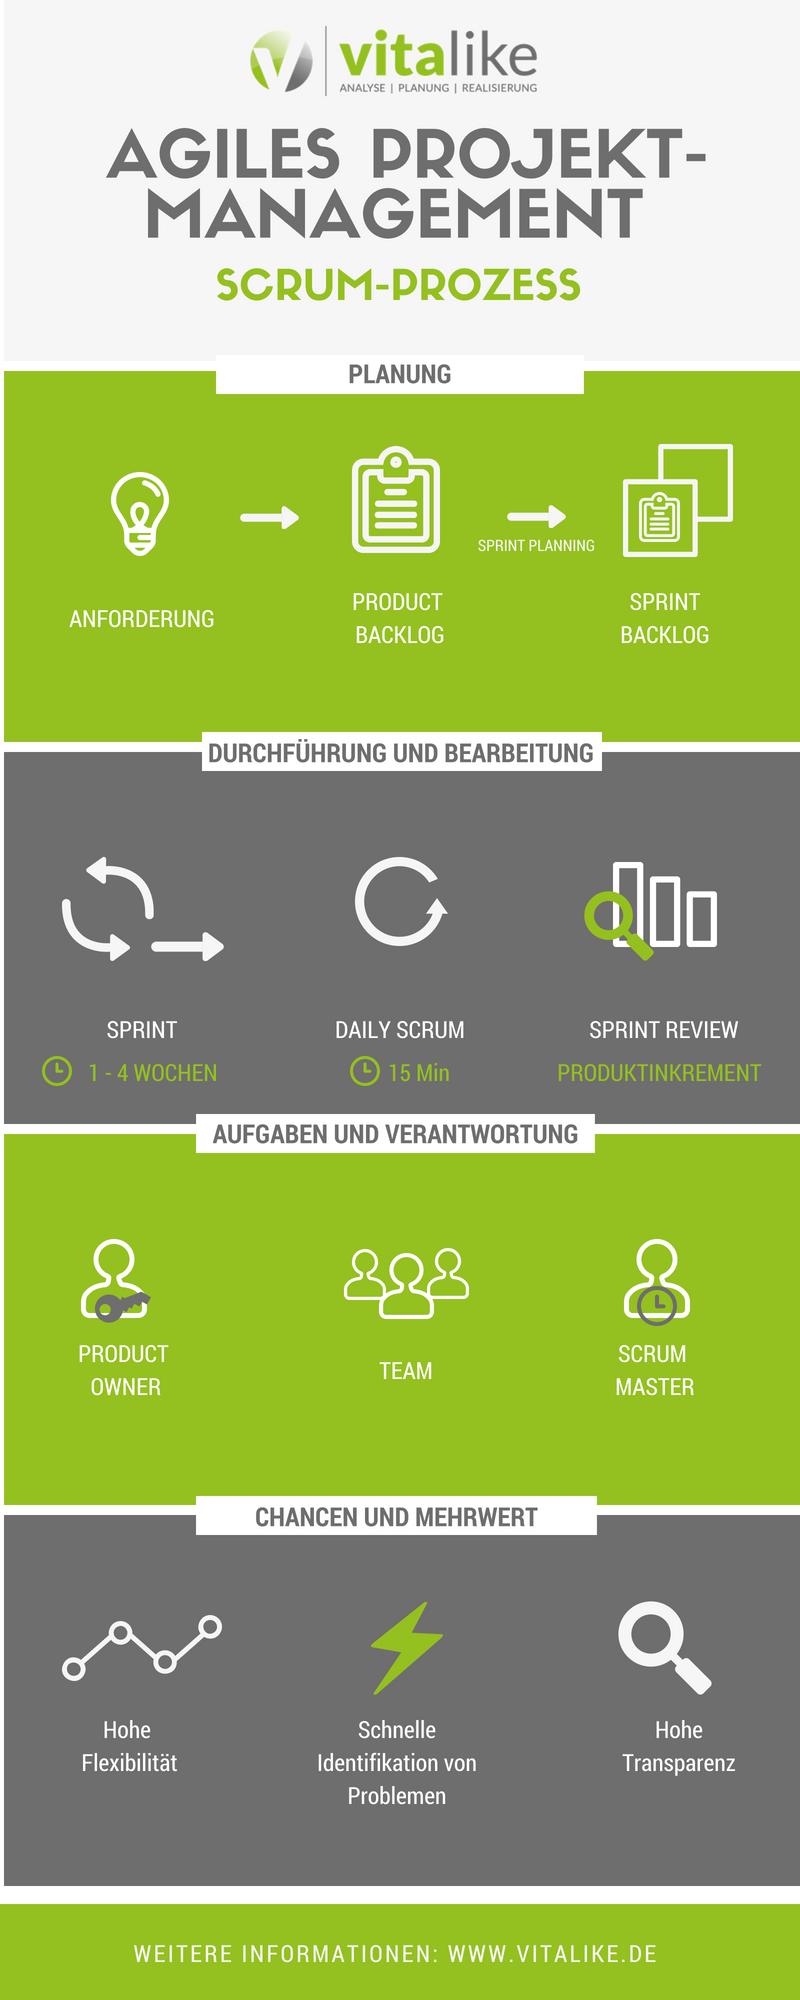 SCRUM-Modell vitalike | vitalike Unternehmensberatung | SCRUM vitalike | Management Consulting